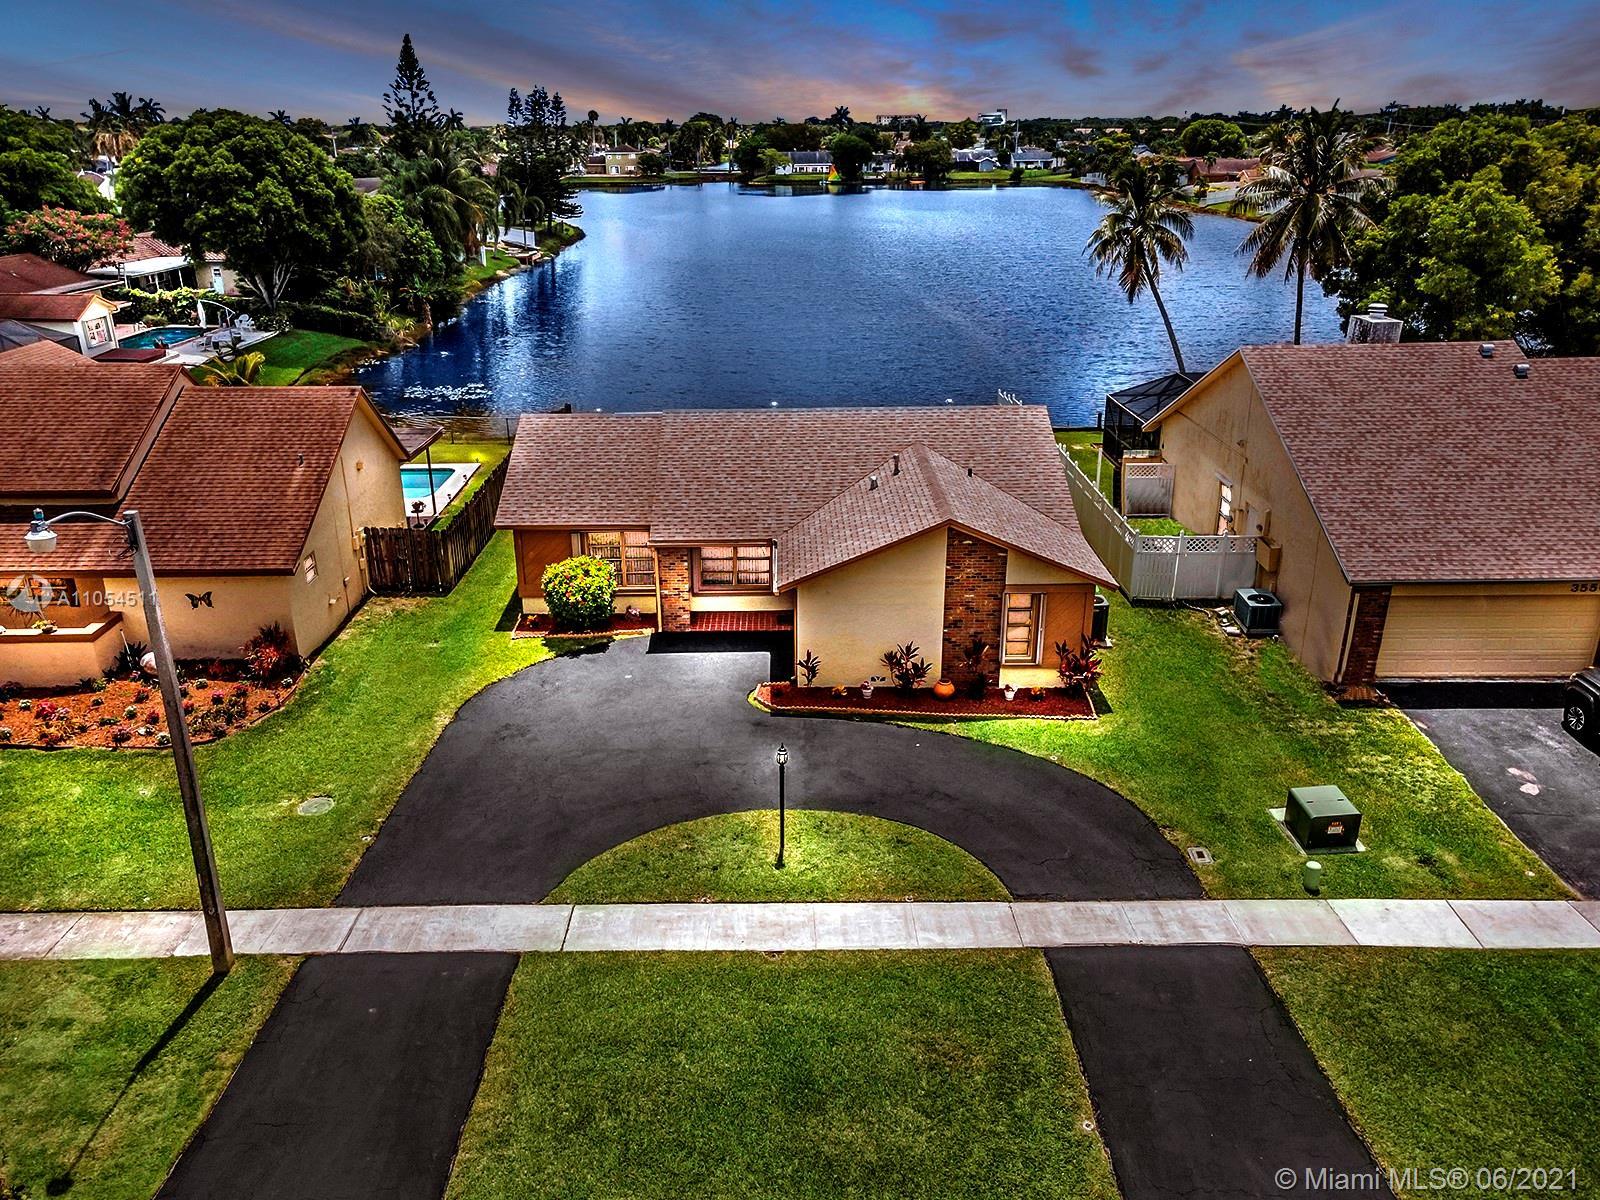 Sunrise Golf Village - 3560 NW 117th Ln, Sunrise, FL 33323